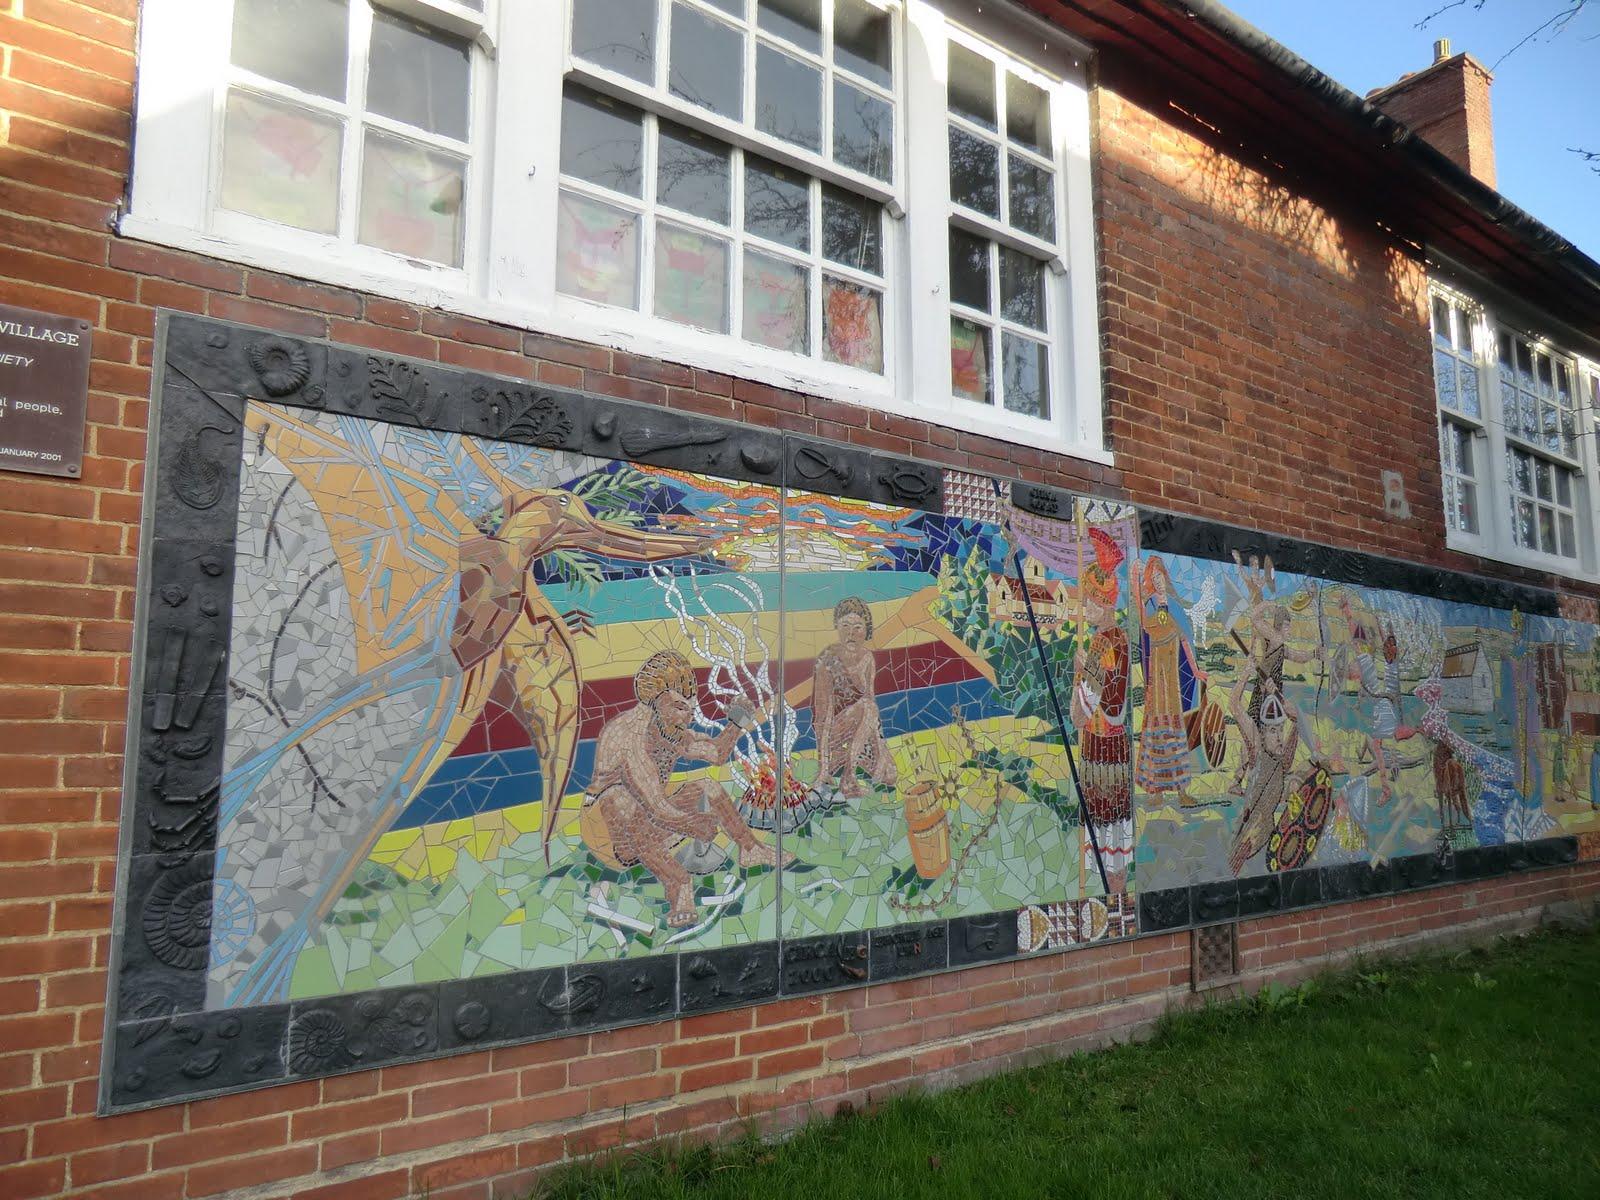 CIMG7989 Millennium mural, Otford